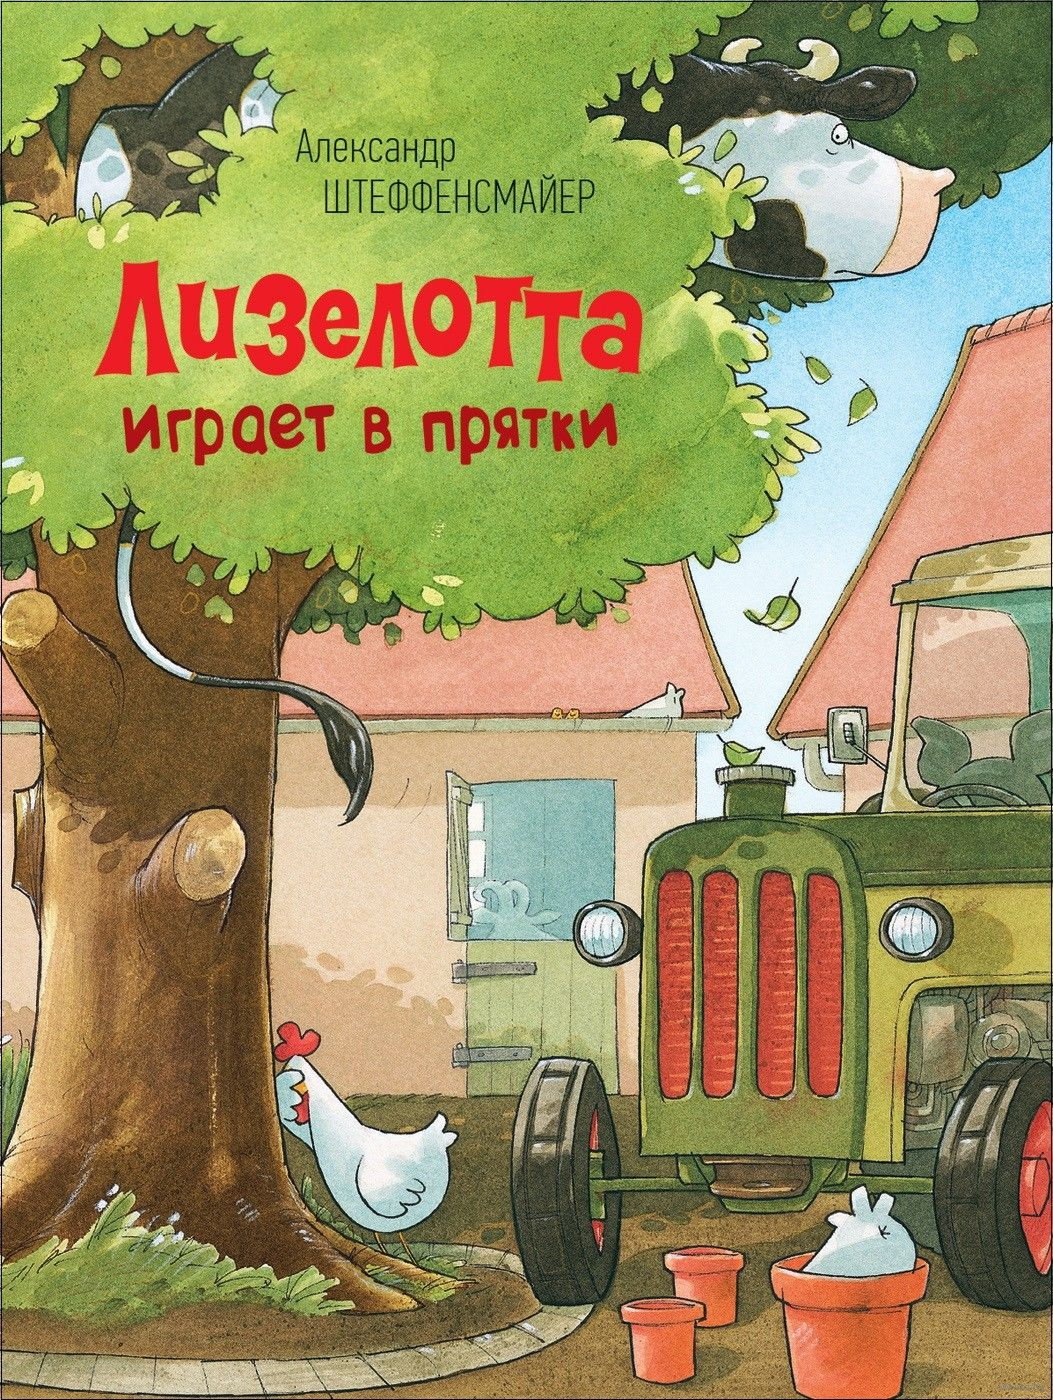 Сказочные истории старой библиотеки / Vana raamatukogu muinasjutud